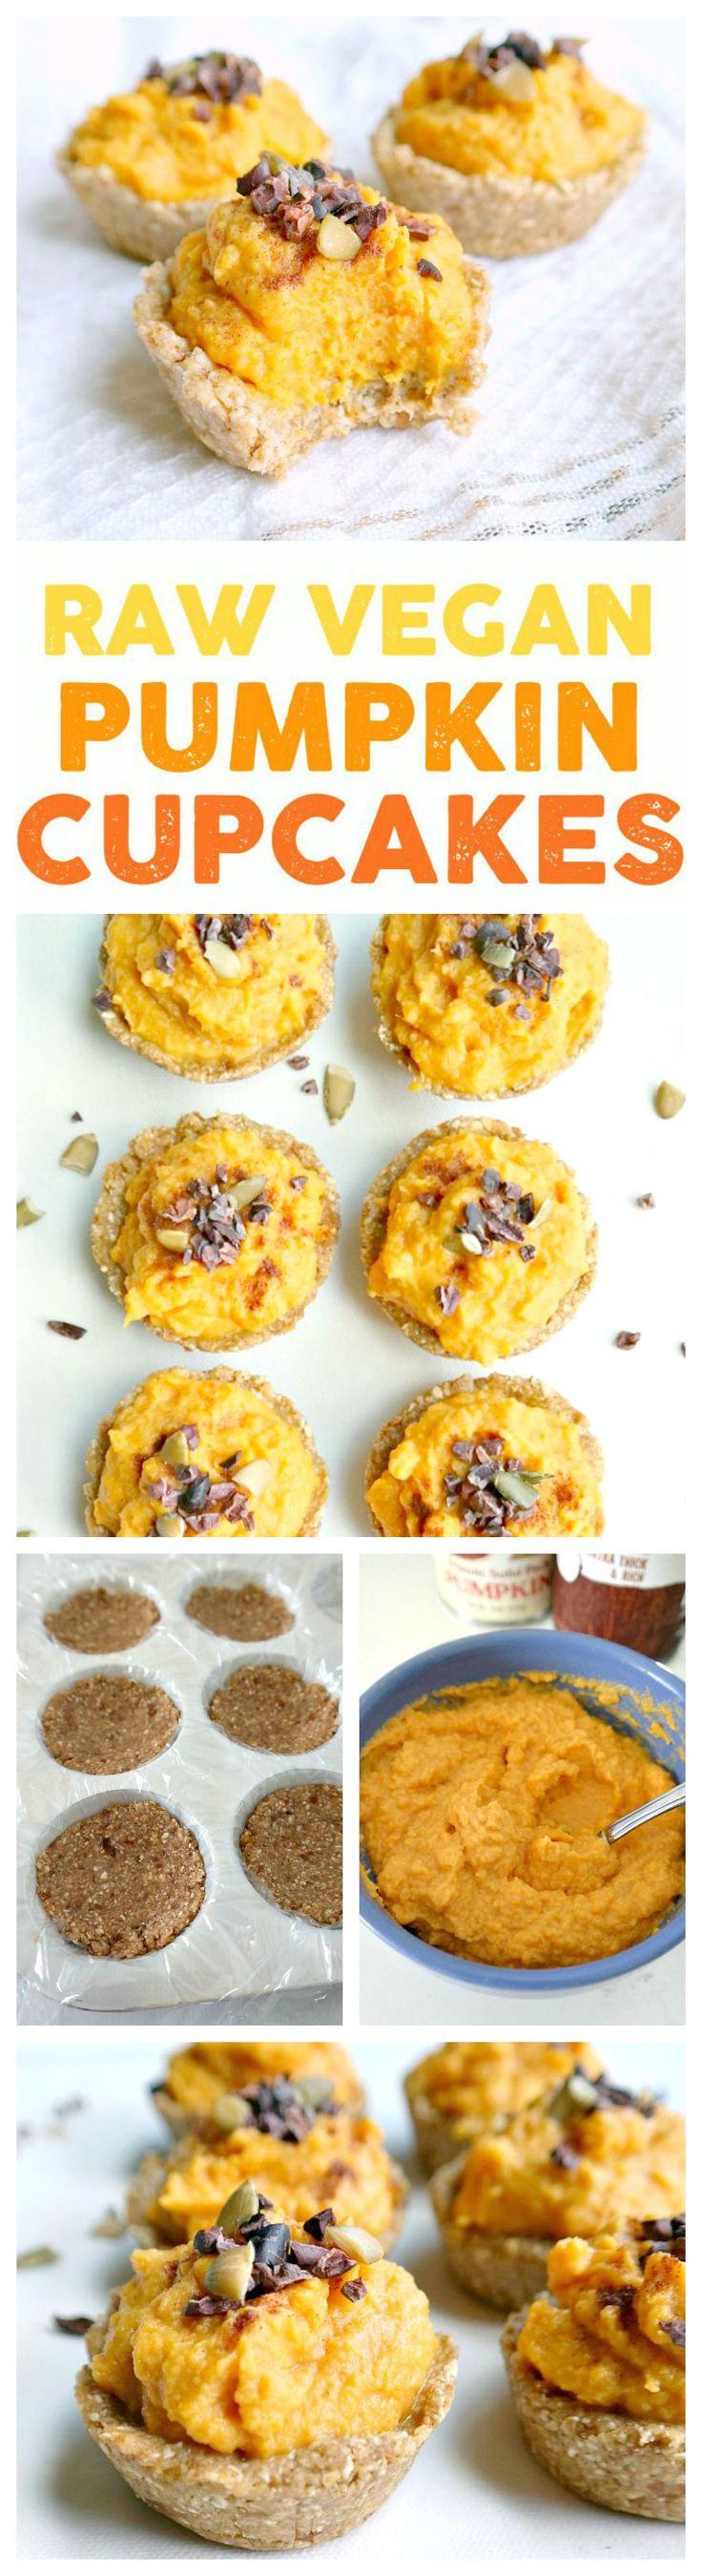 ... Cupcakes | Recipe | Pumpkin Cupcakes, Vegan Pumpkin and Raw Vegan